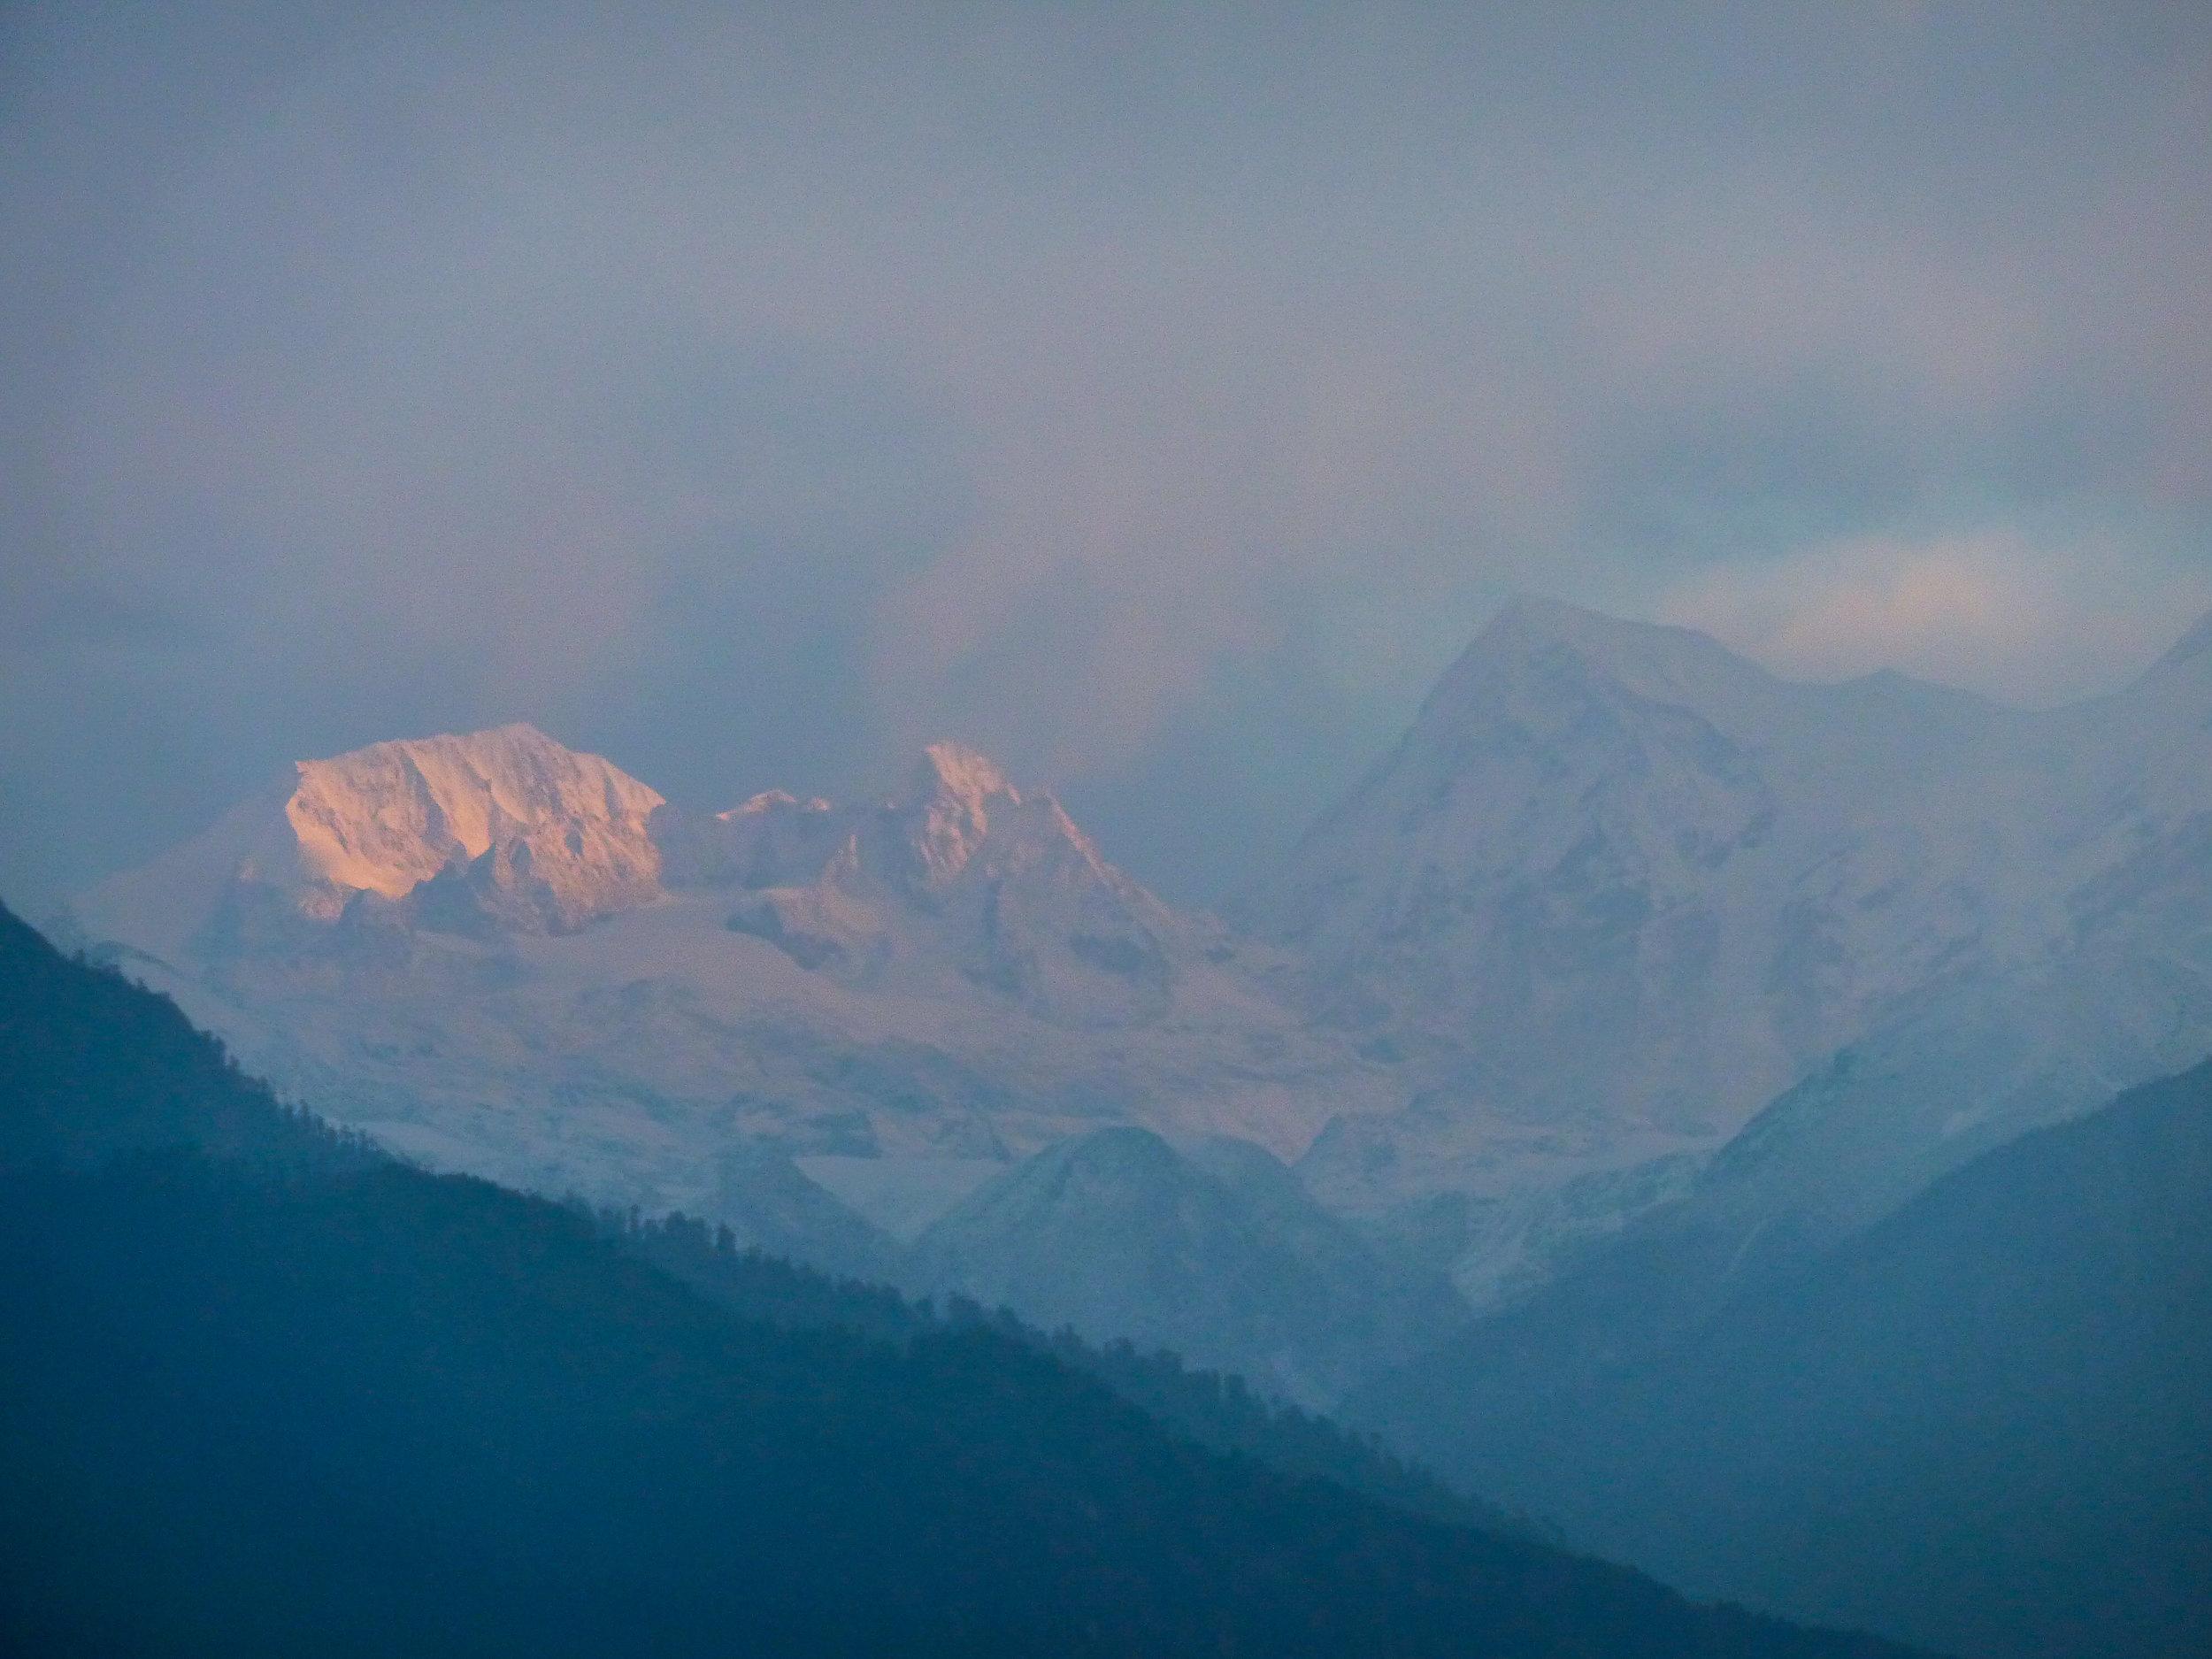 Sunrise over Kanchenjunga-Range